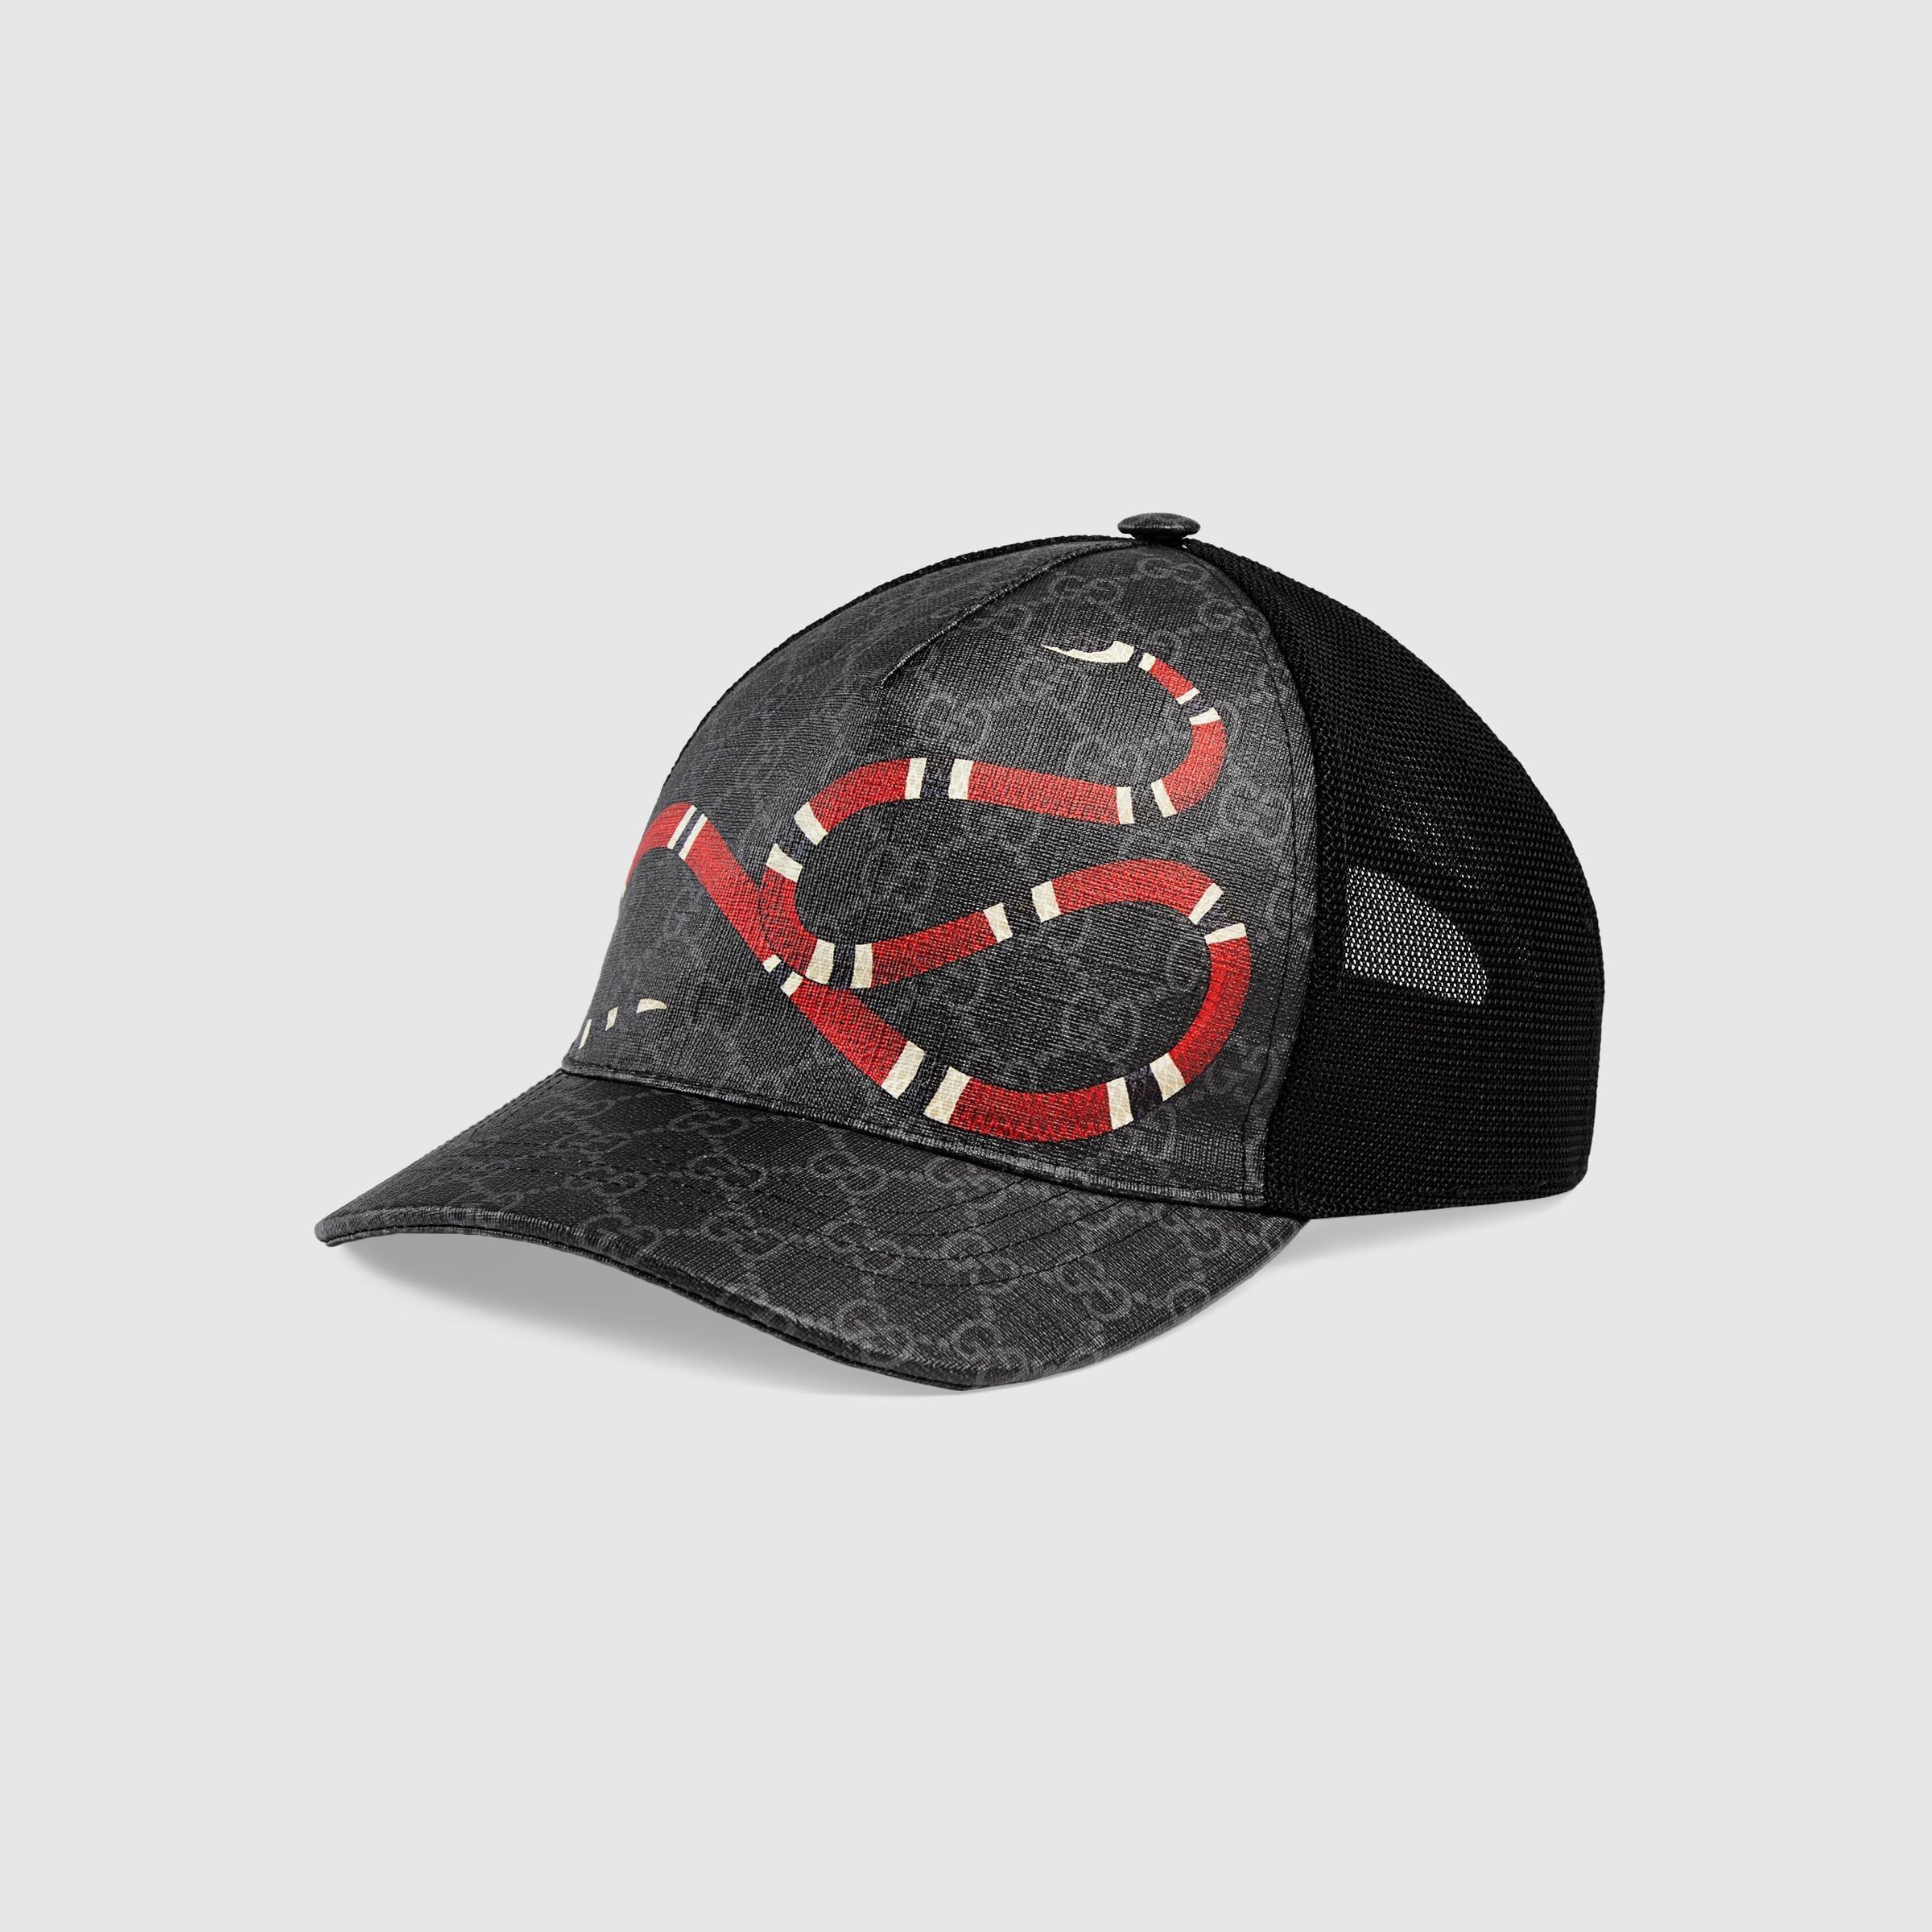 Mua Mũ Gucci Kingsnake Print GG Supreme Baseball Black Size S con rắn, Giá tốt 1